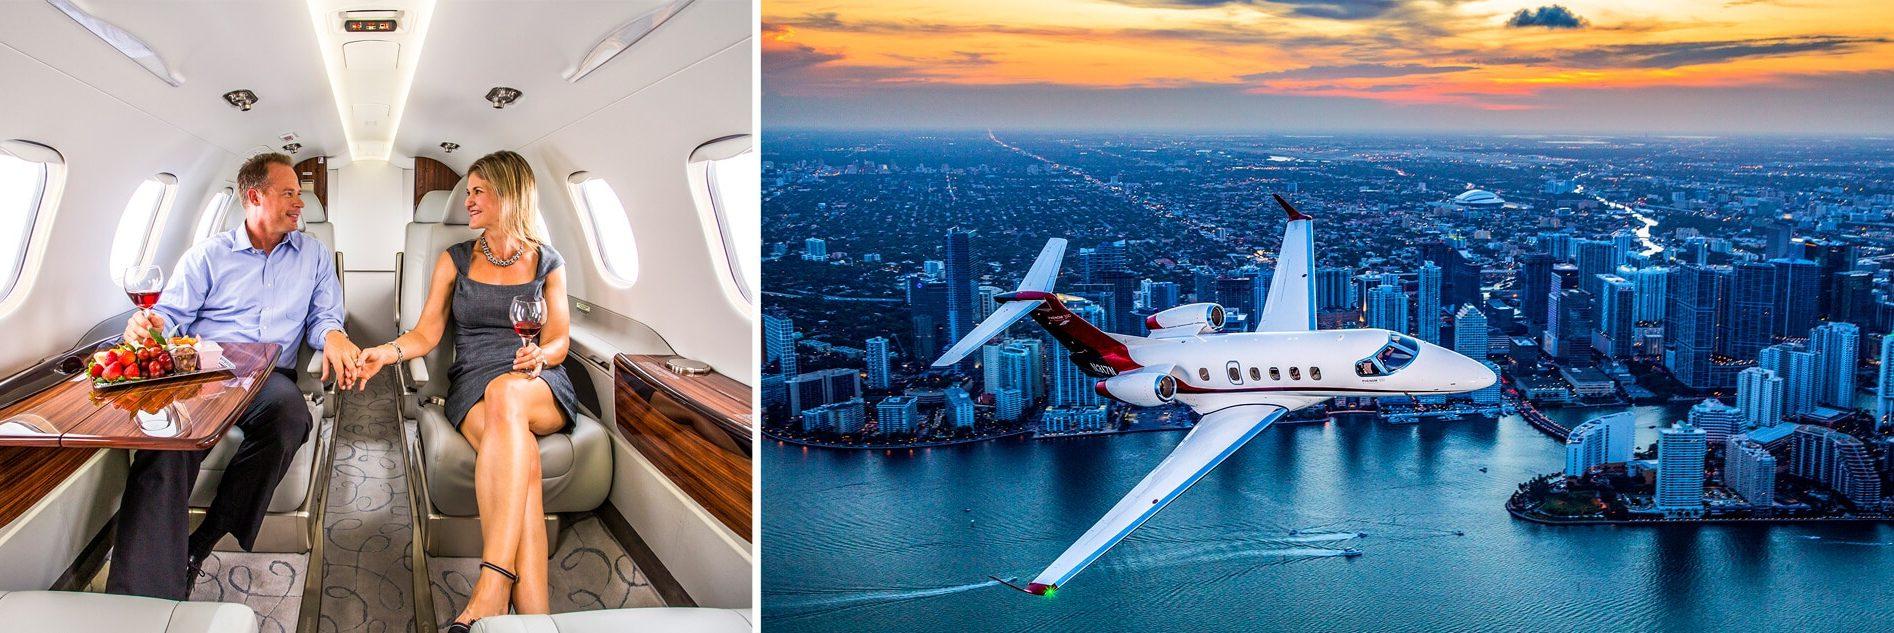 Phenom 300 Interior Couple Enjoying Wine and Aerial Over Miami